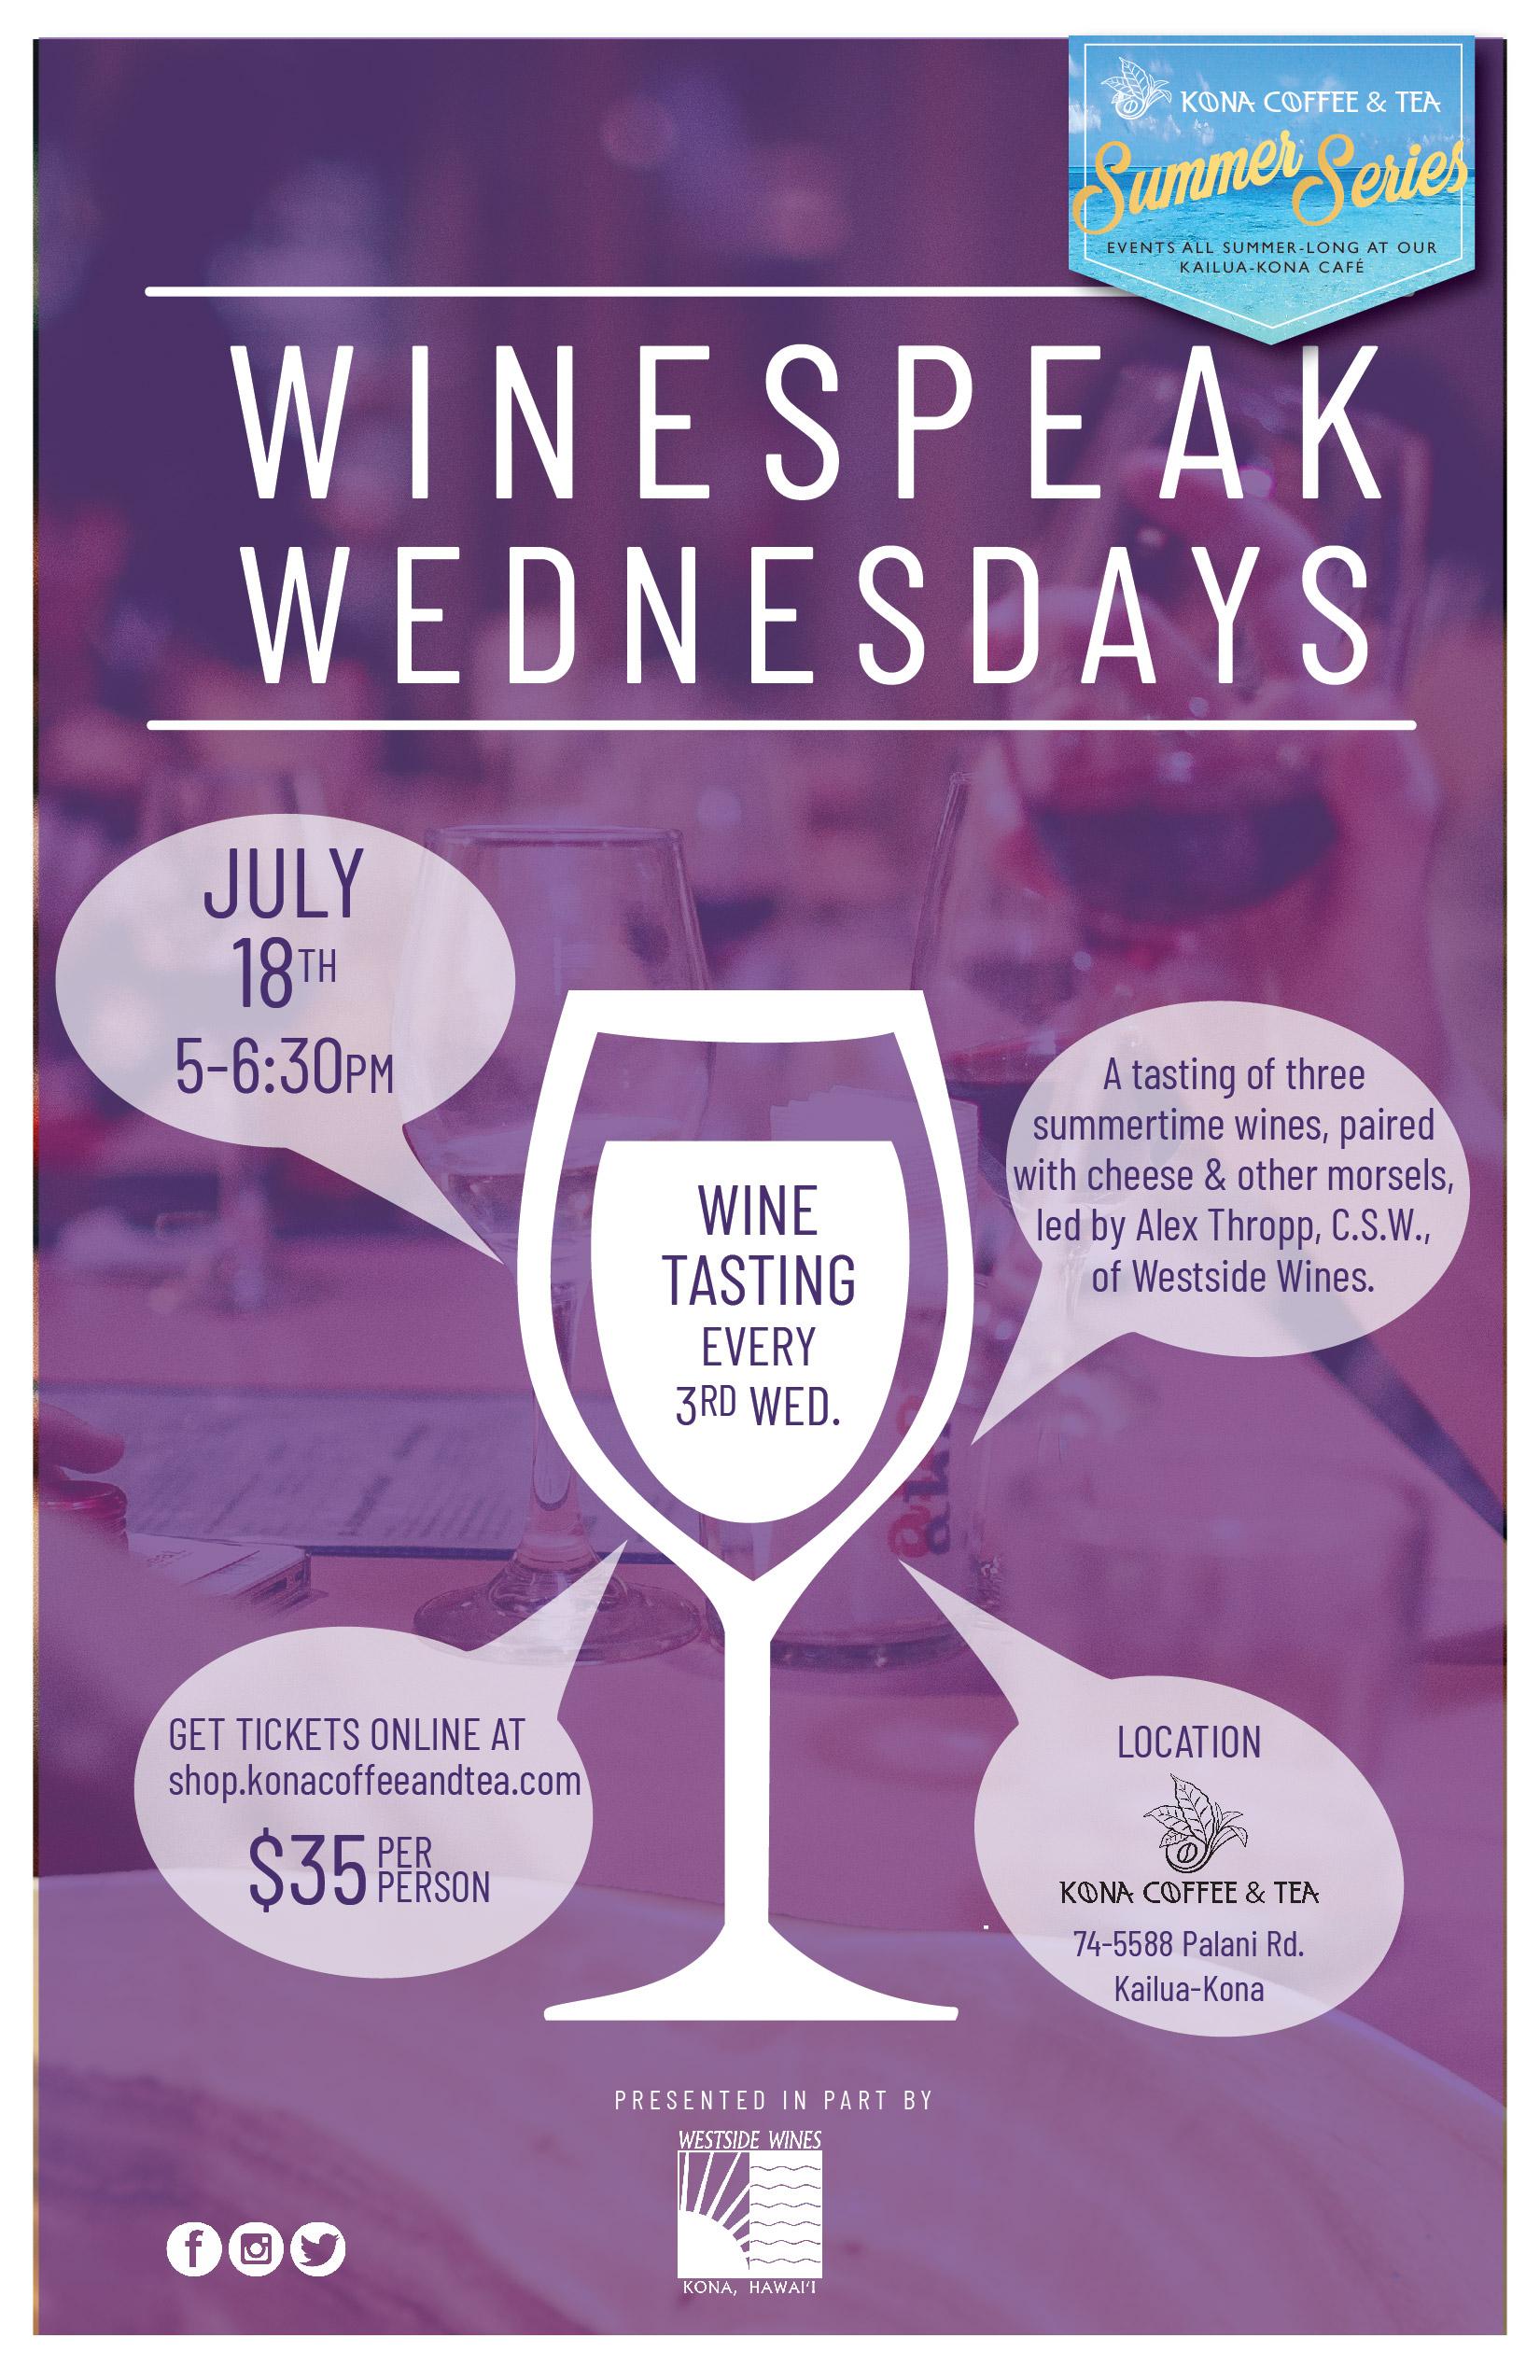 WineSpeak Wednesdays_7.18.18_KCTC 11x17 poster-01-01.jpg